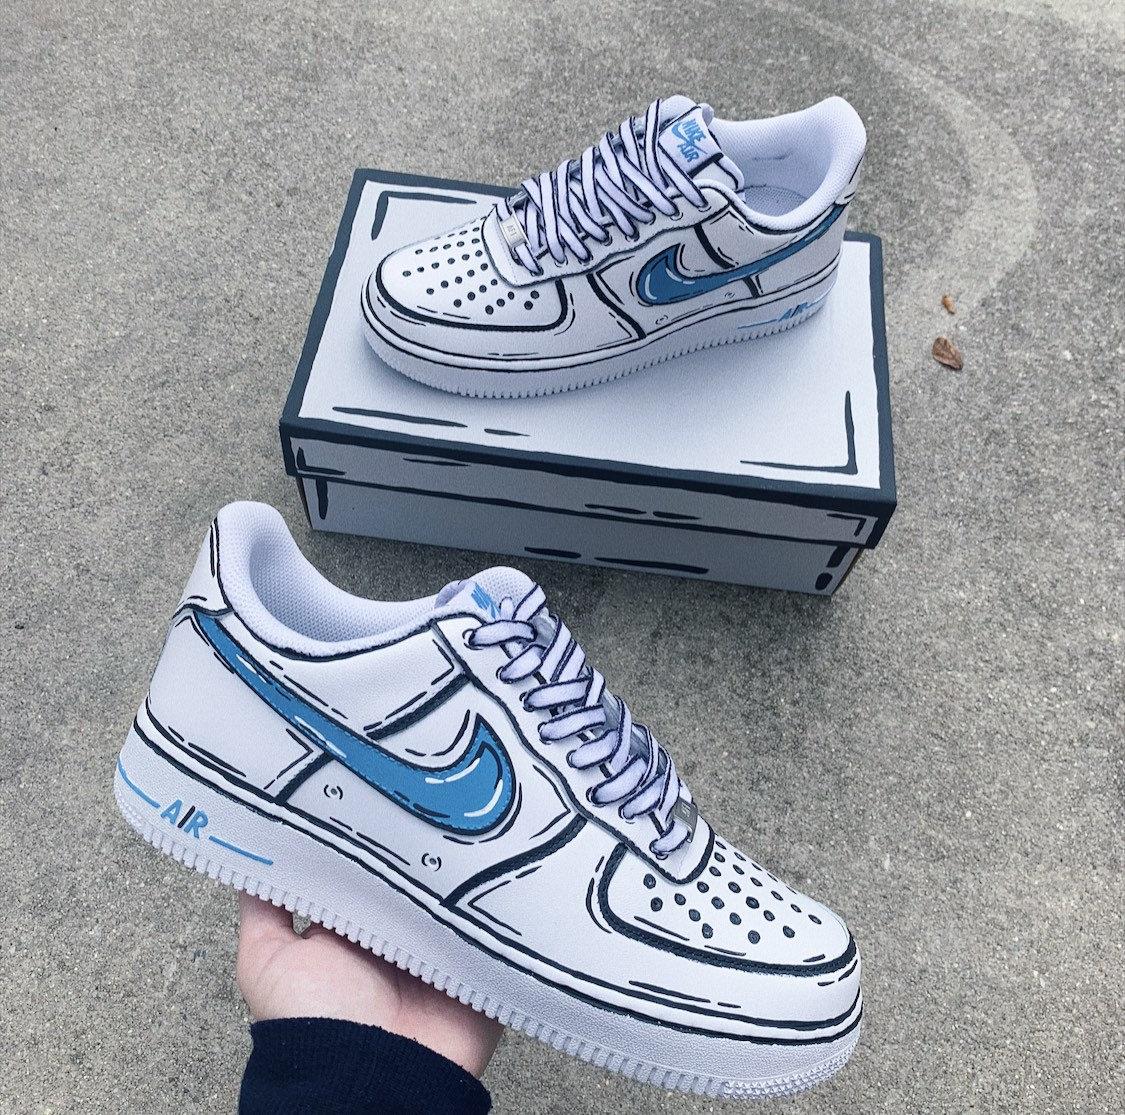 Cartoon Nike Air Force 1 Custom Shoes (Made To Order) Custom Sneakers